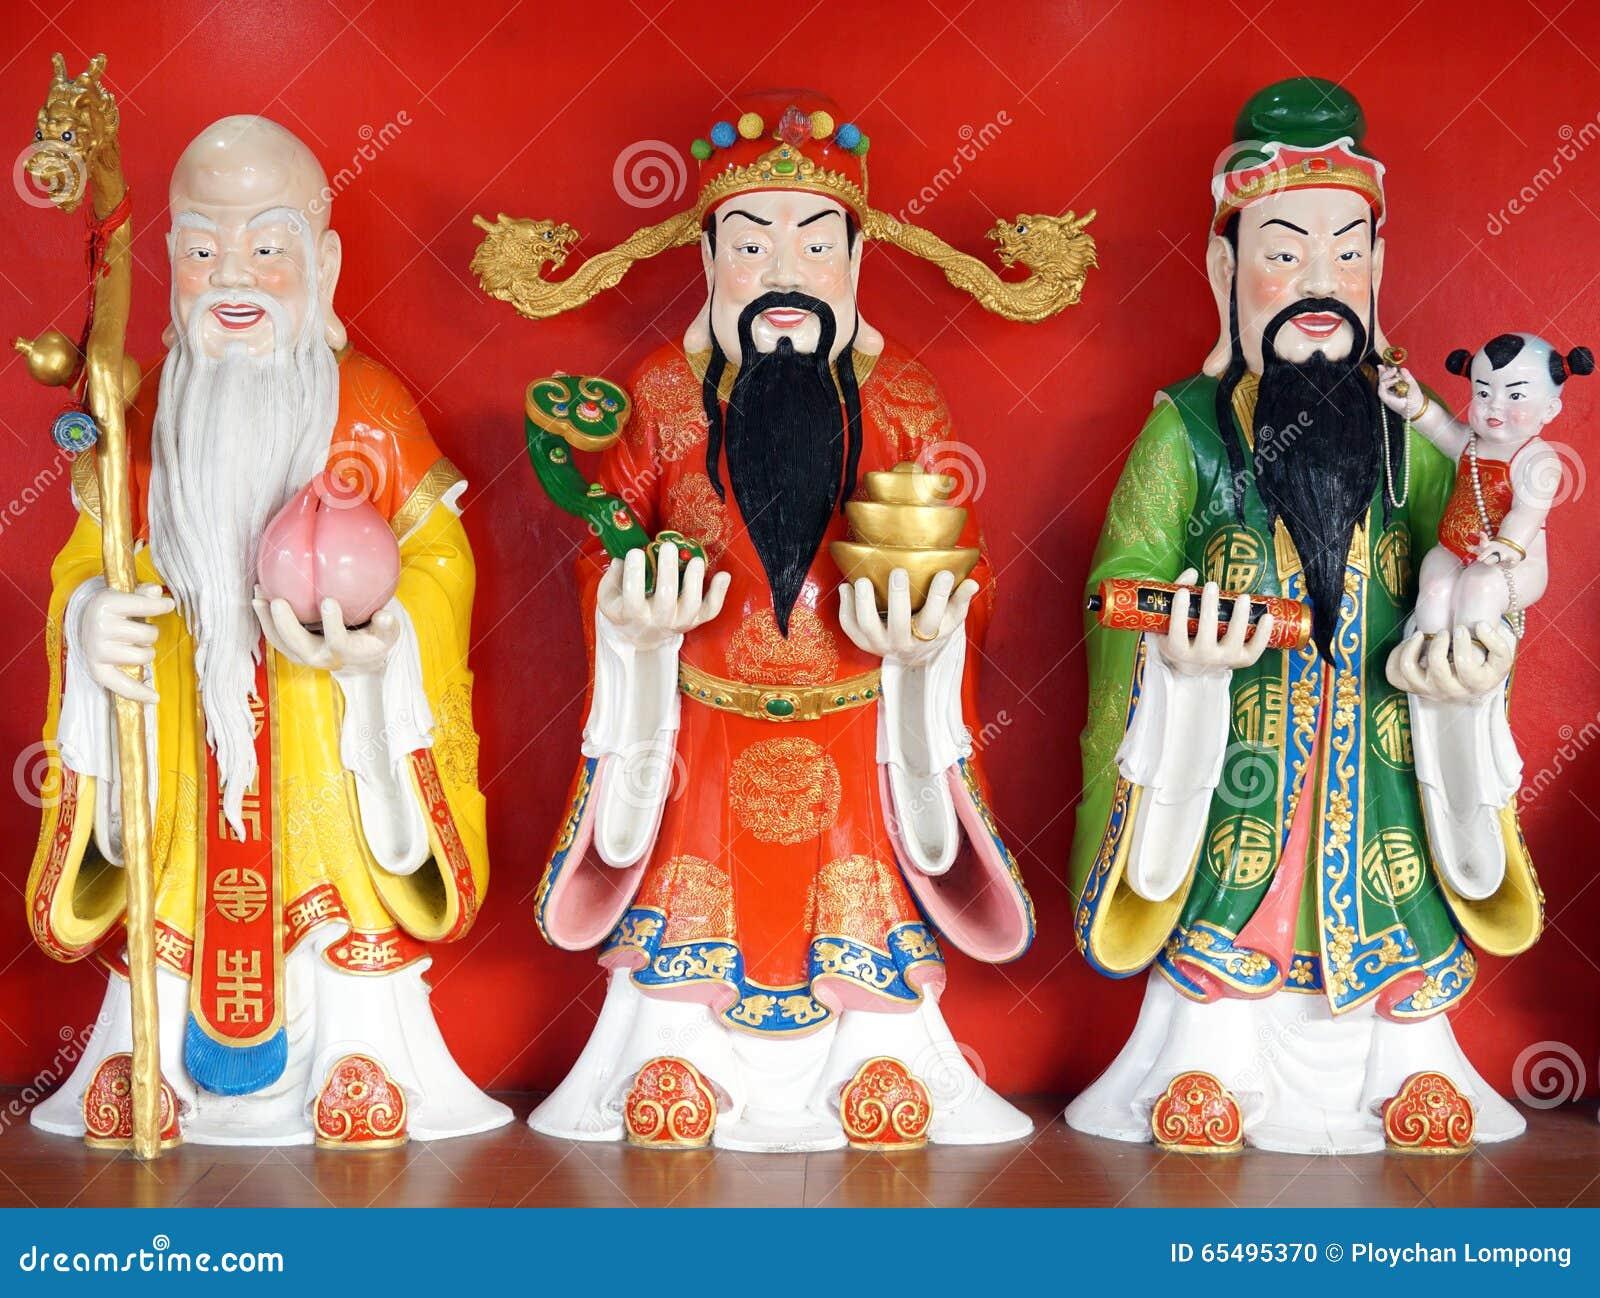 Good Fortune (Fu,Hok), Prosperity (Lu,Lok), and Longevity (Shou,Siu) statue.